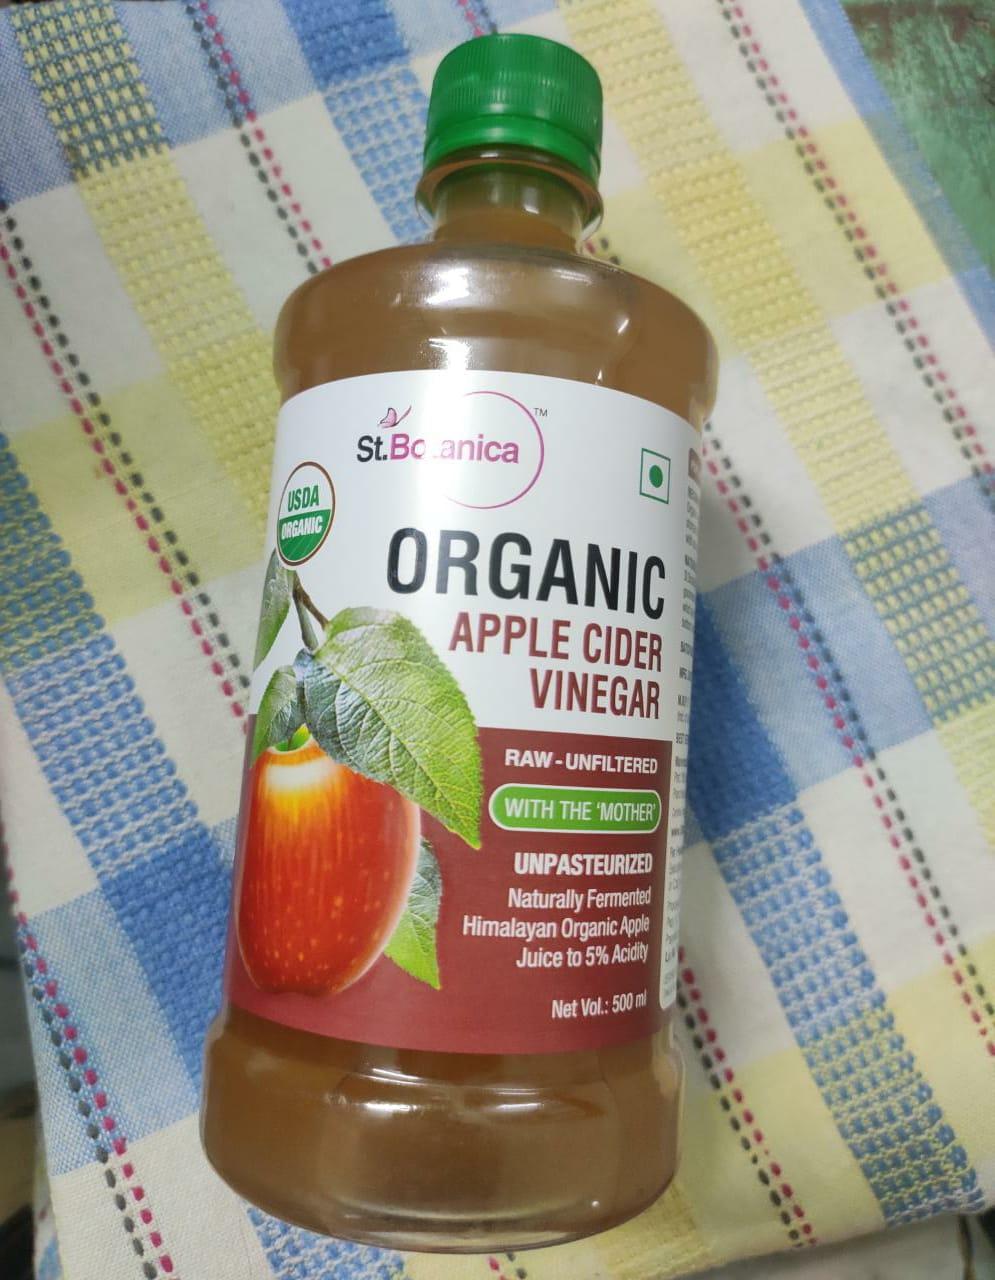 St.Botanica USDA Organic Apple Cider Vinegar -Worth Buying-By sushreetapal